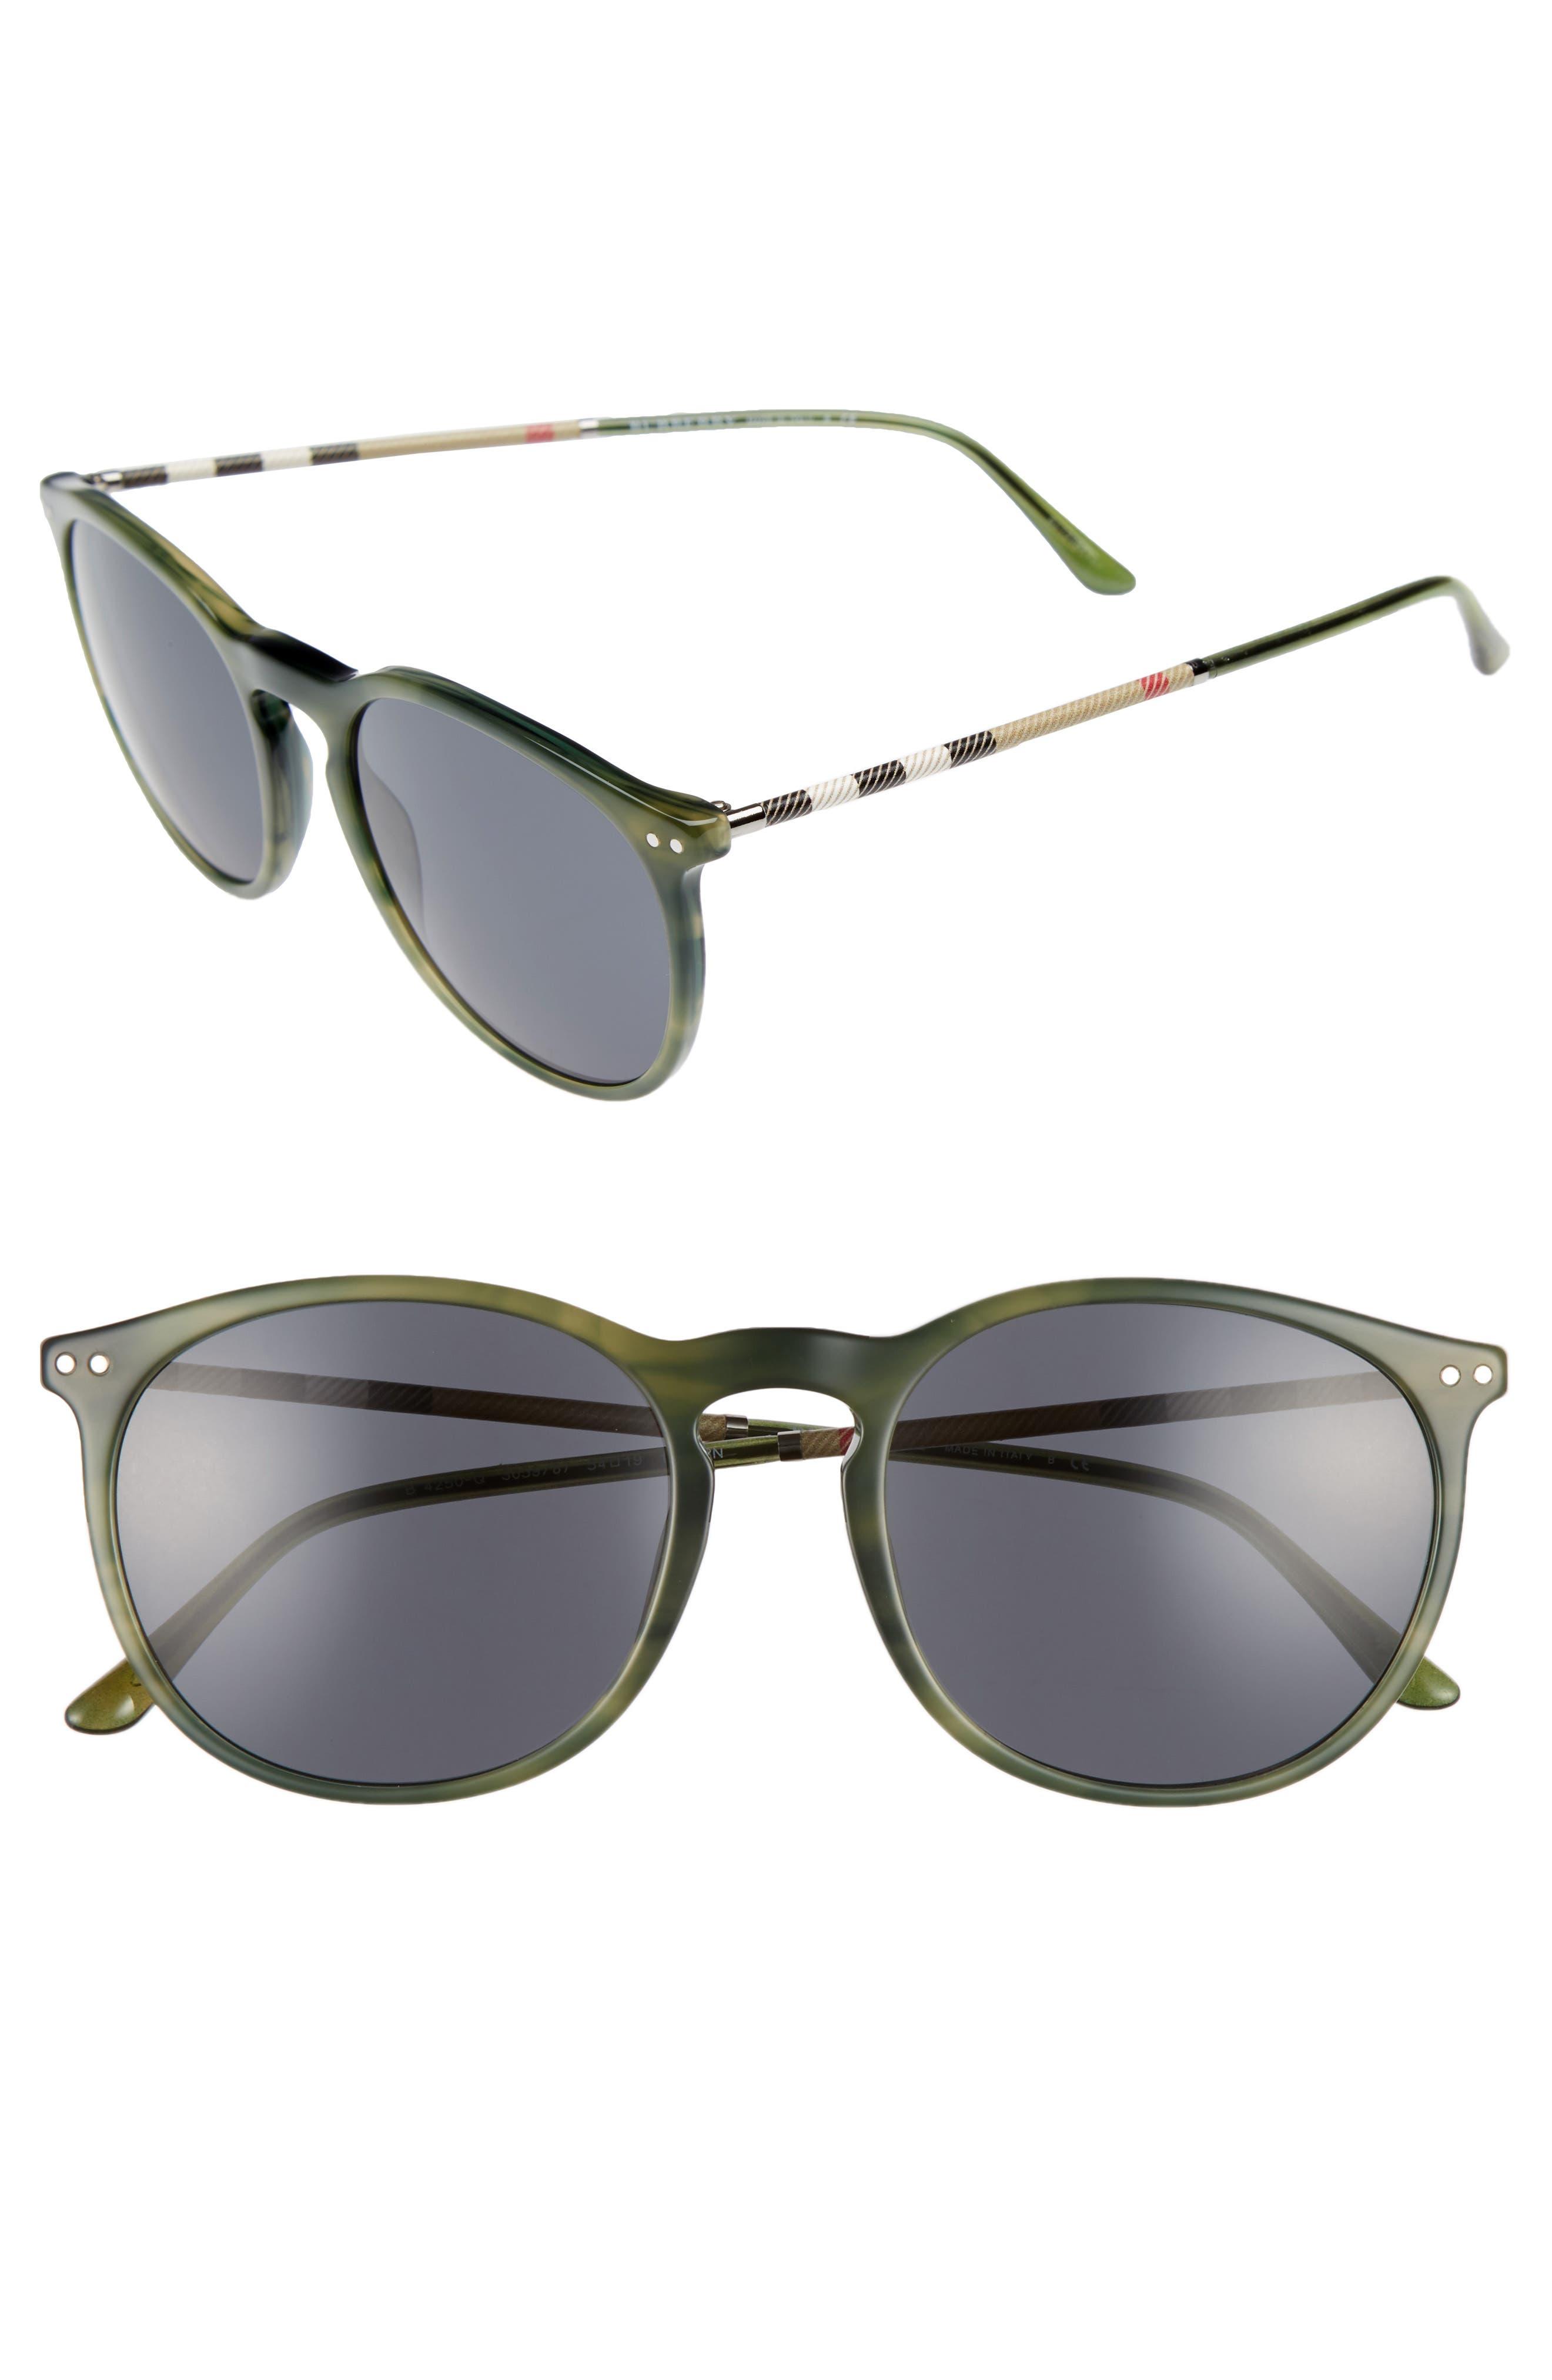 54mm Sunglasses,                         Main,                         color, Grey/ Green